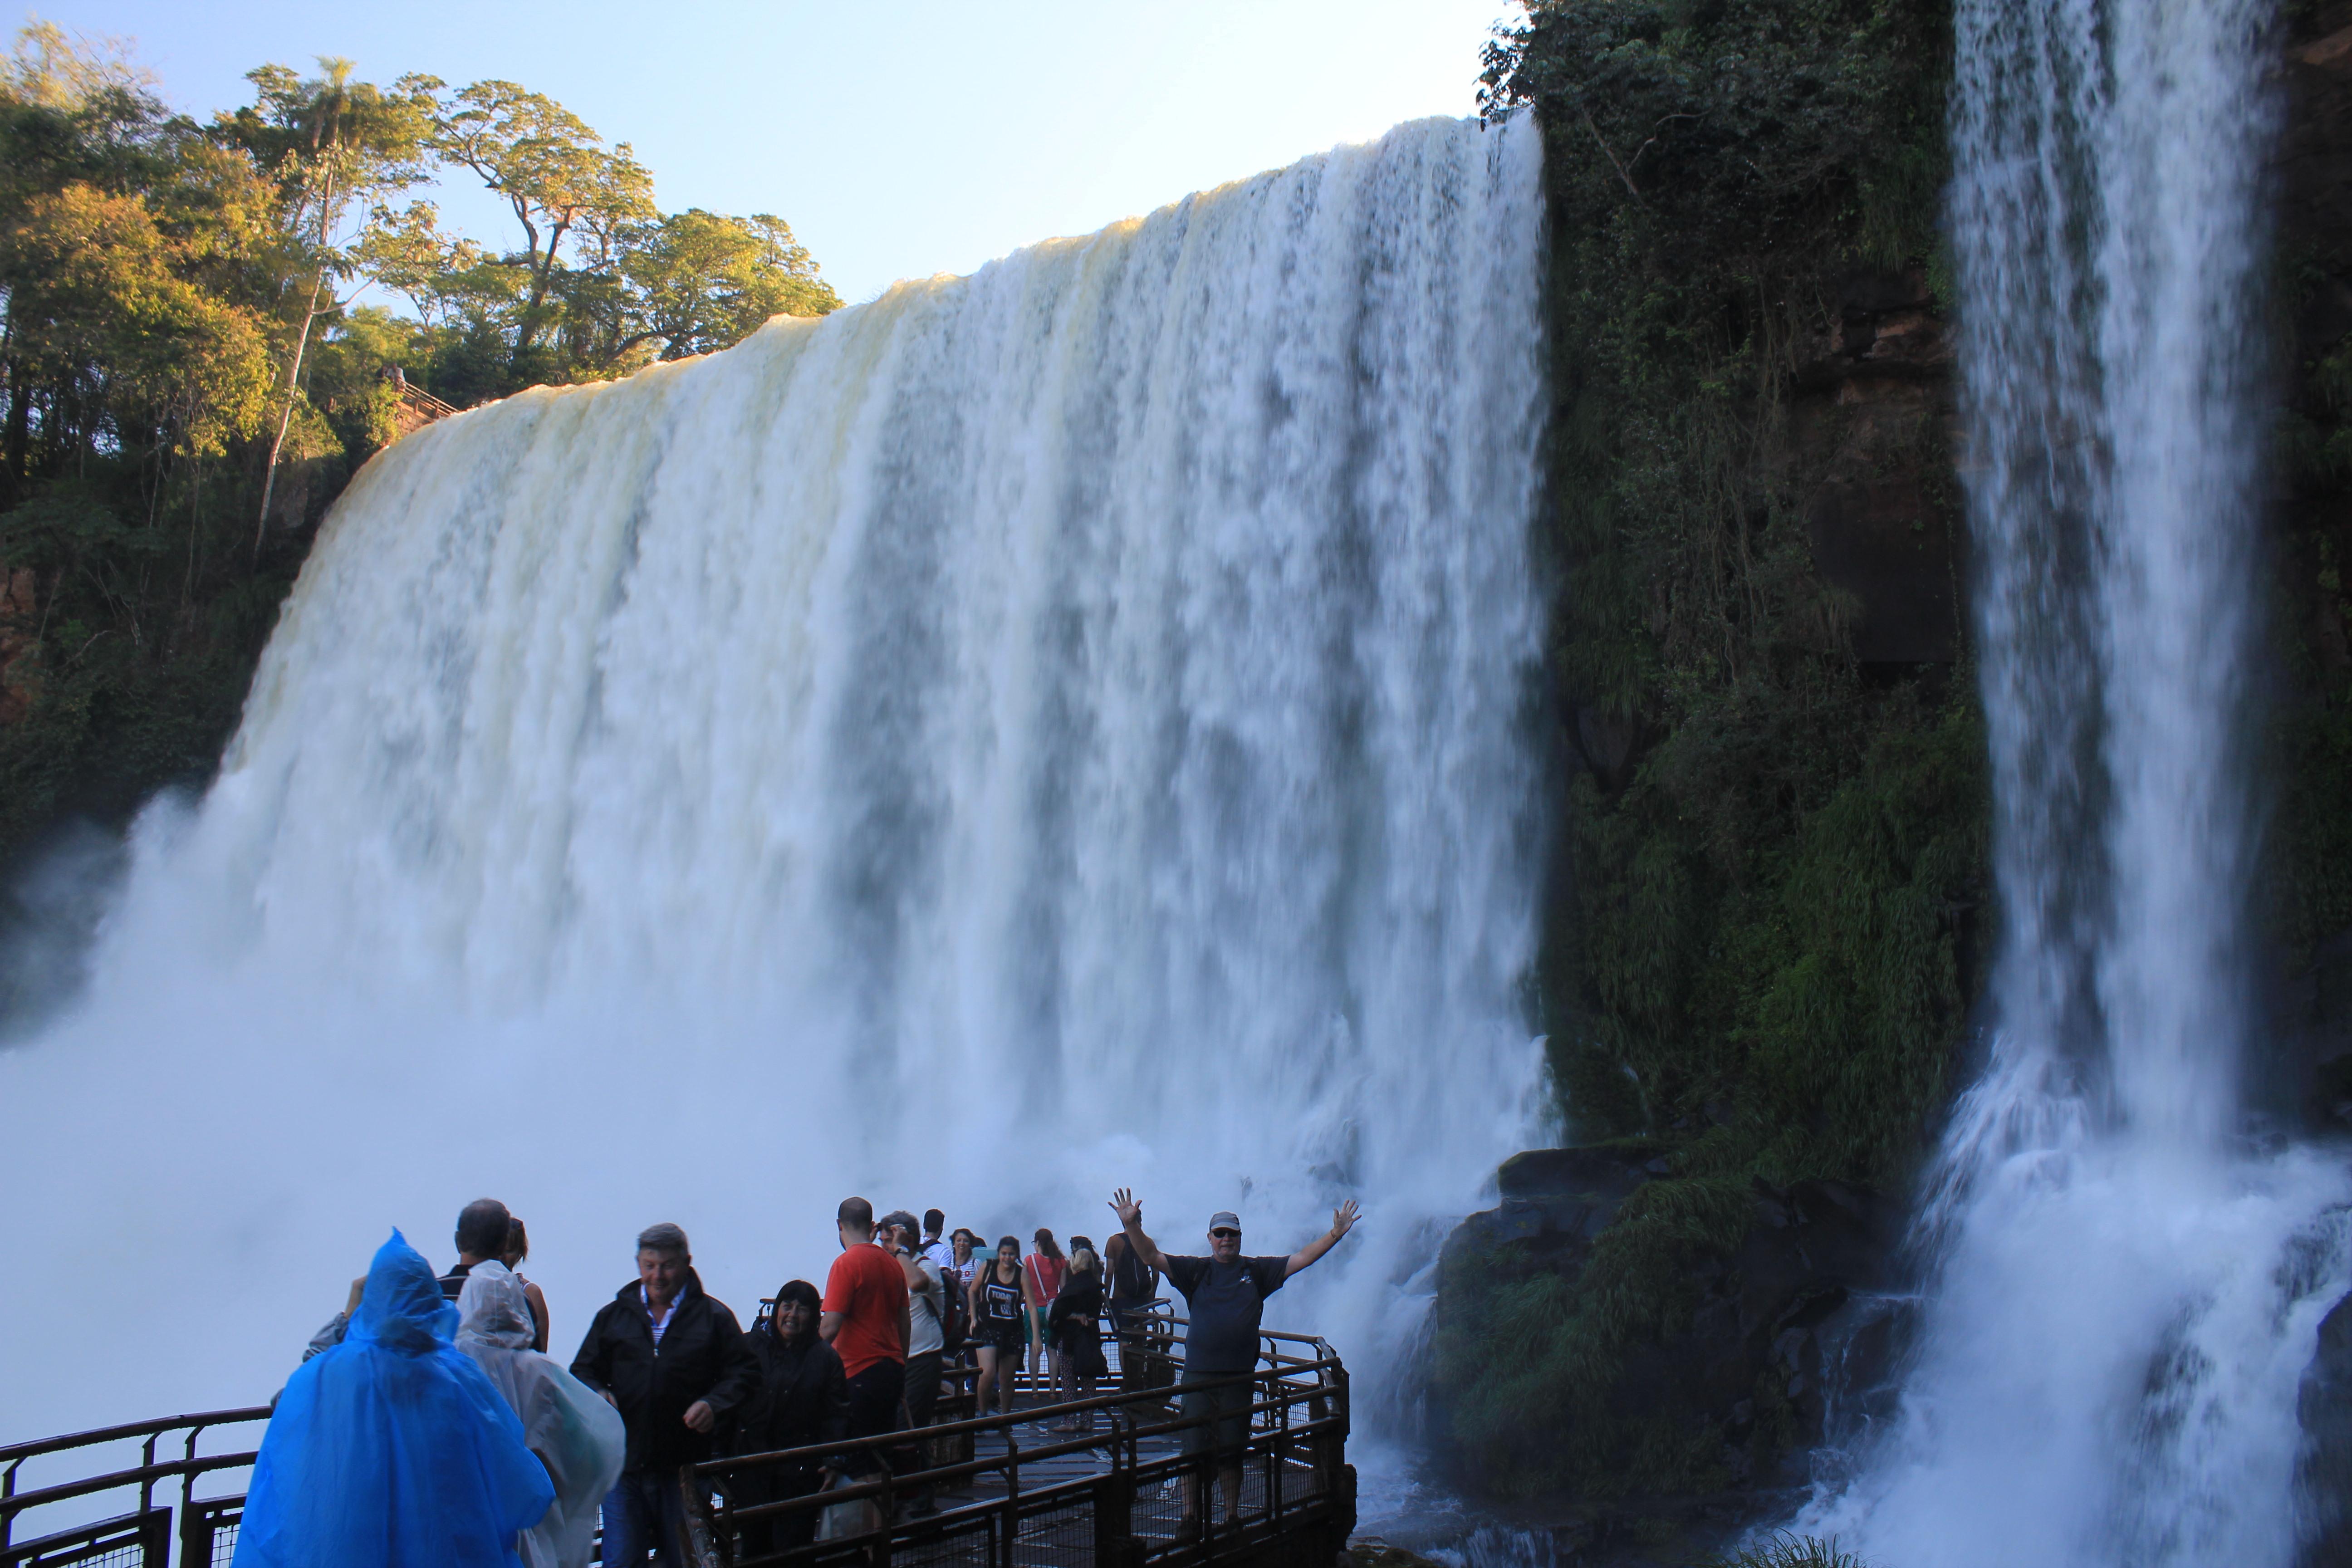 img_7606 Incredible Iguazú Falls Argentina